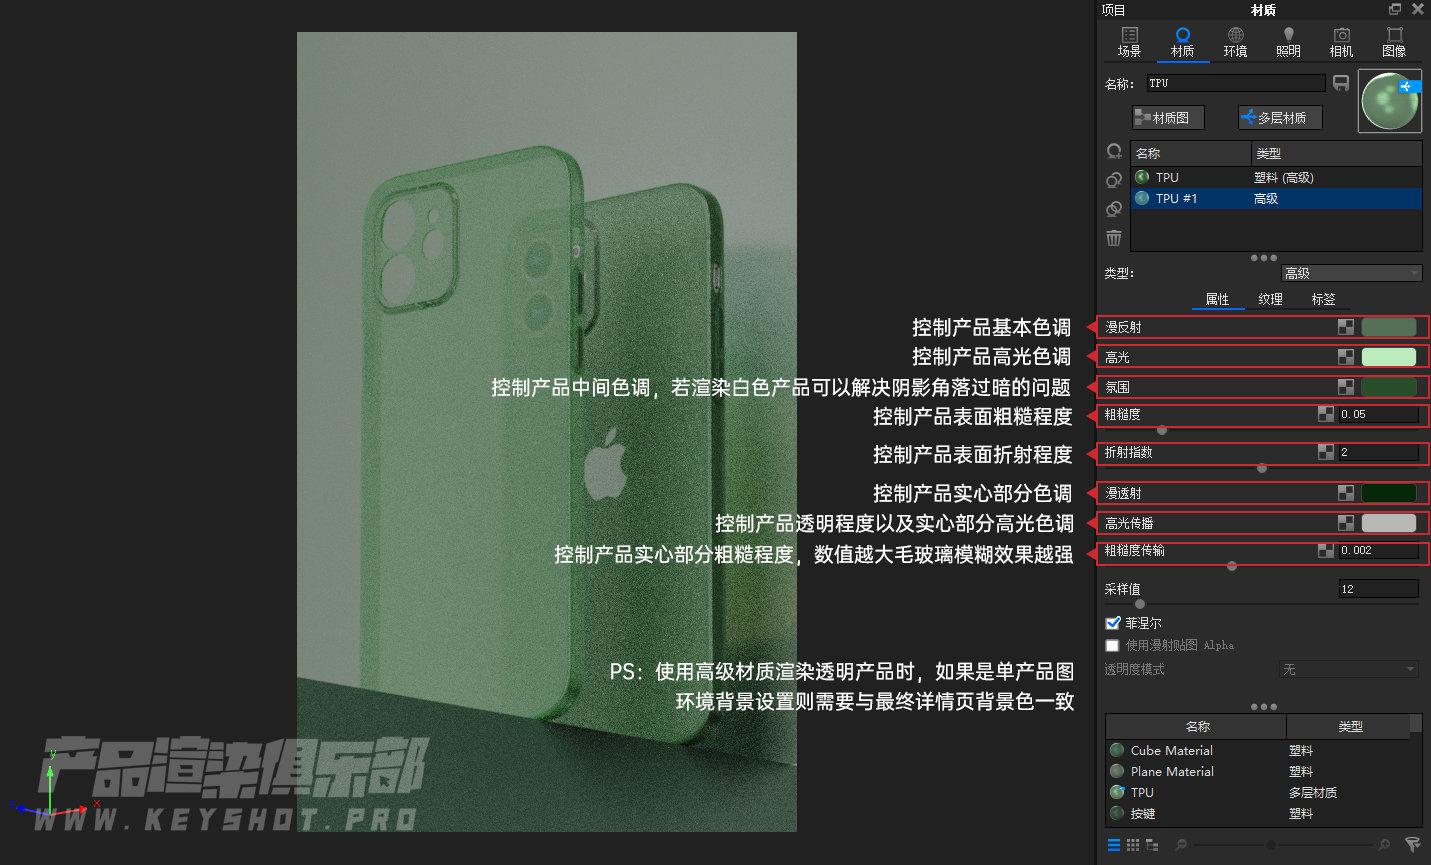 keyshot半透明磨砂壳渲染小小心得(高级材质)